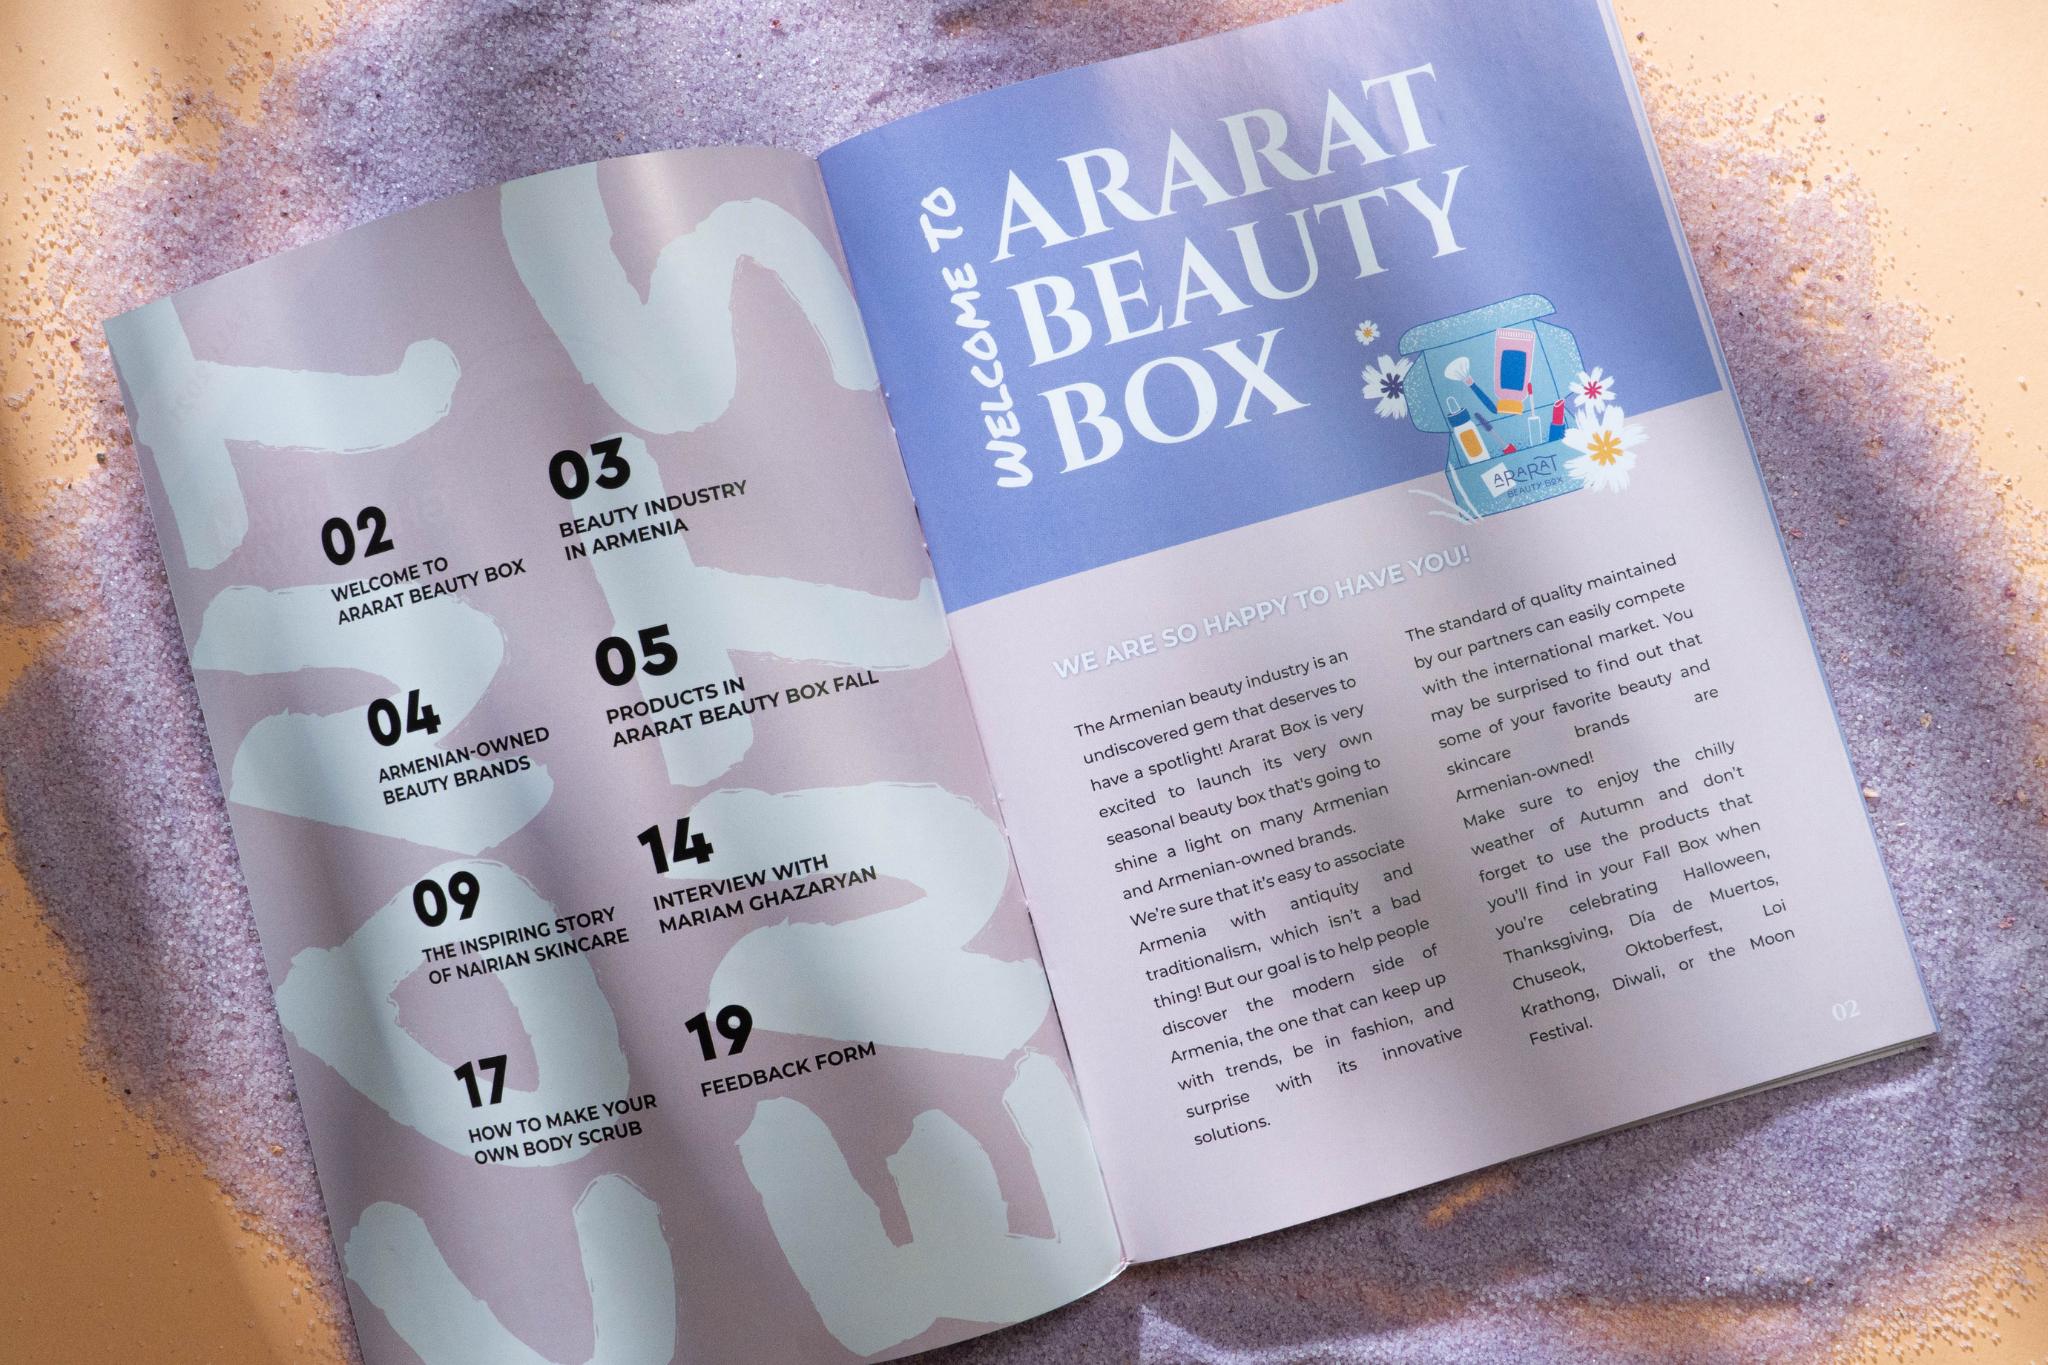 Ararat box